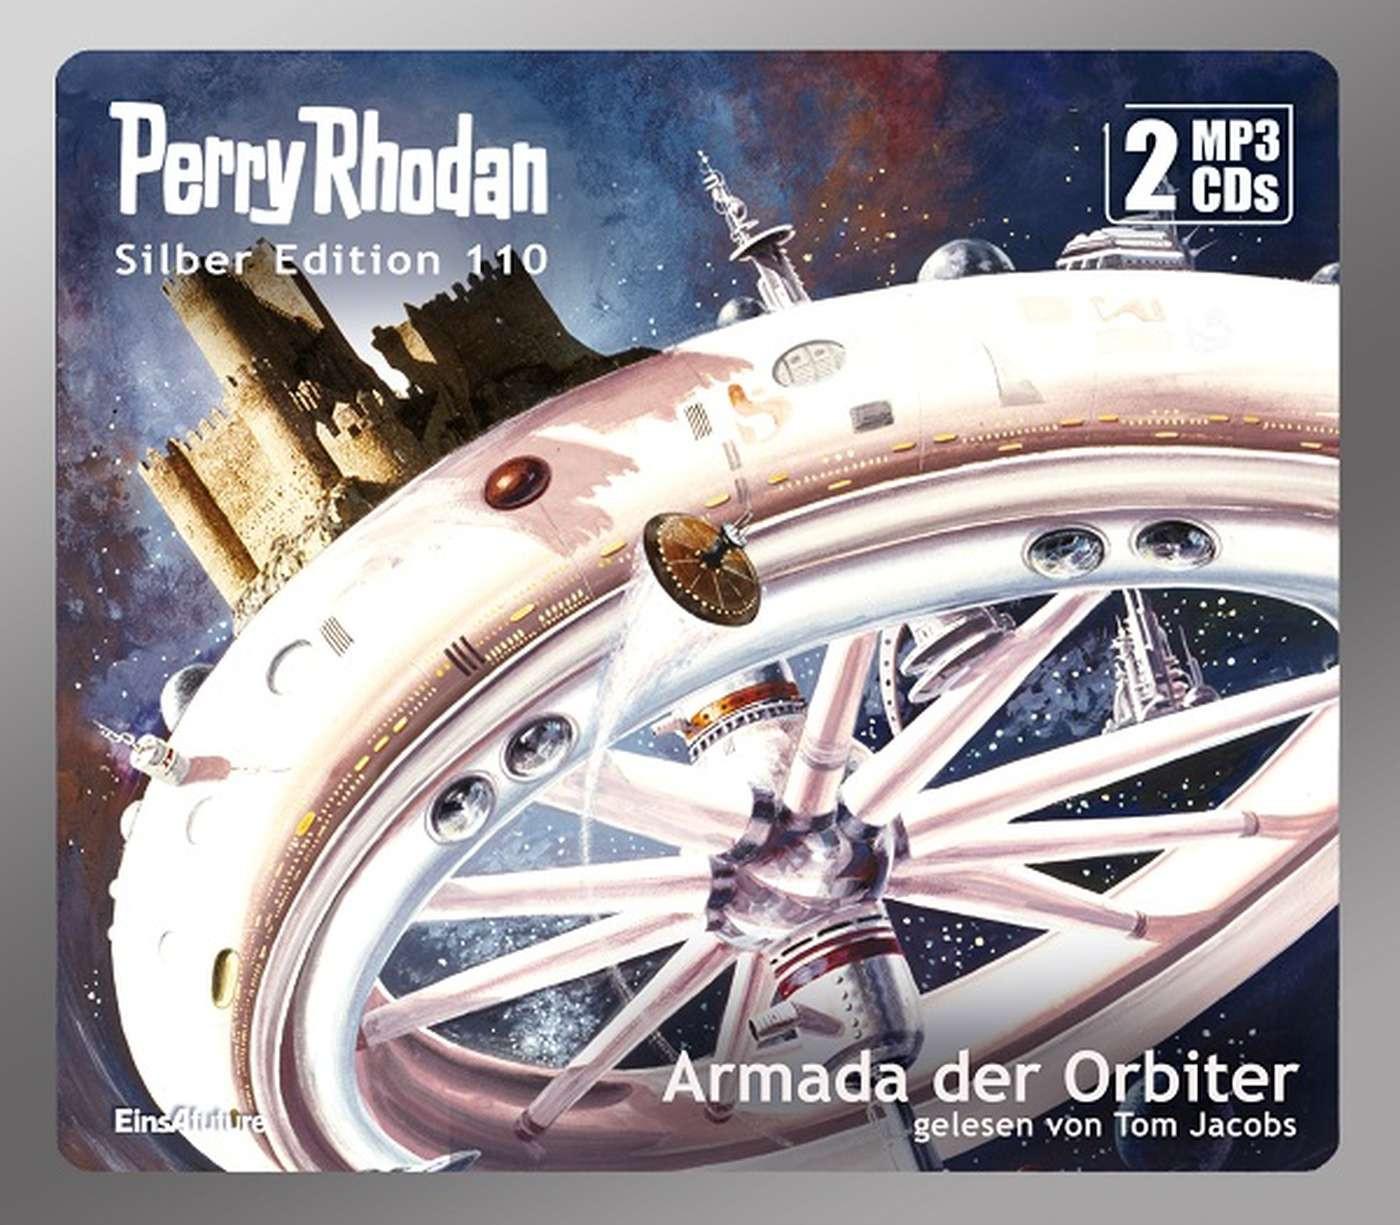 Perry Rhodan Silber Edition 110: Armada der Orbiter (2 mp3-CDs)